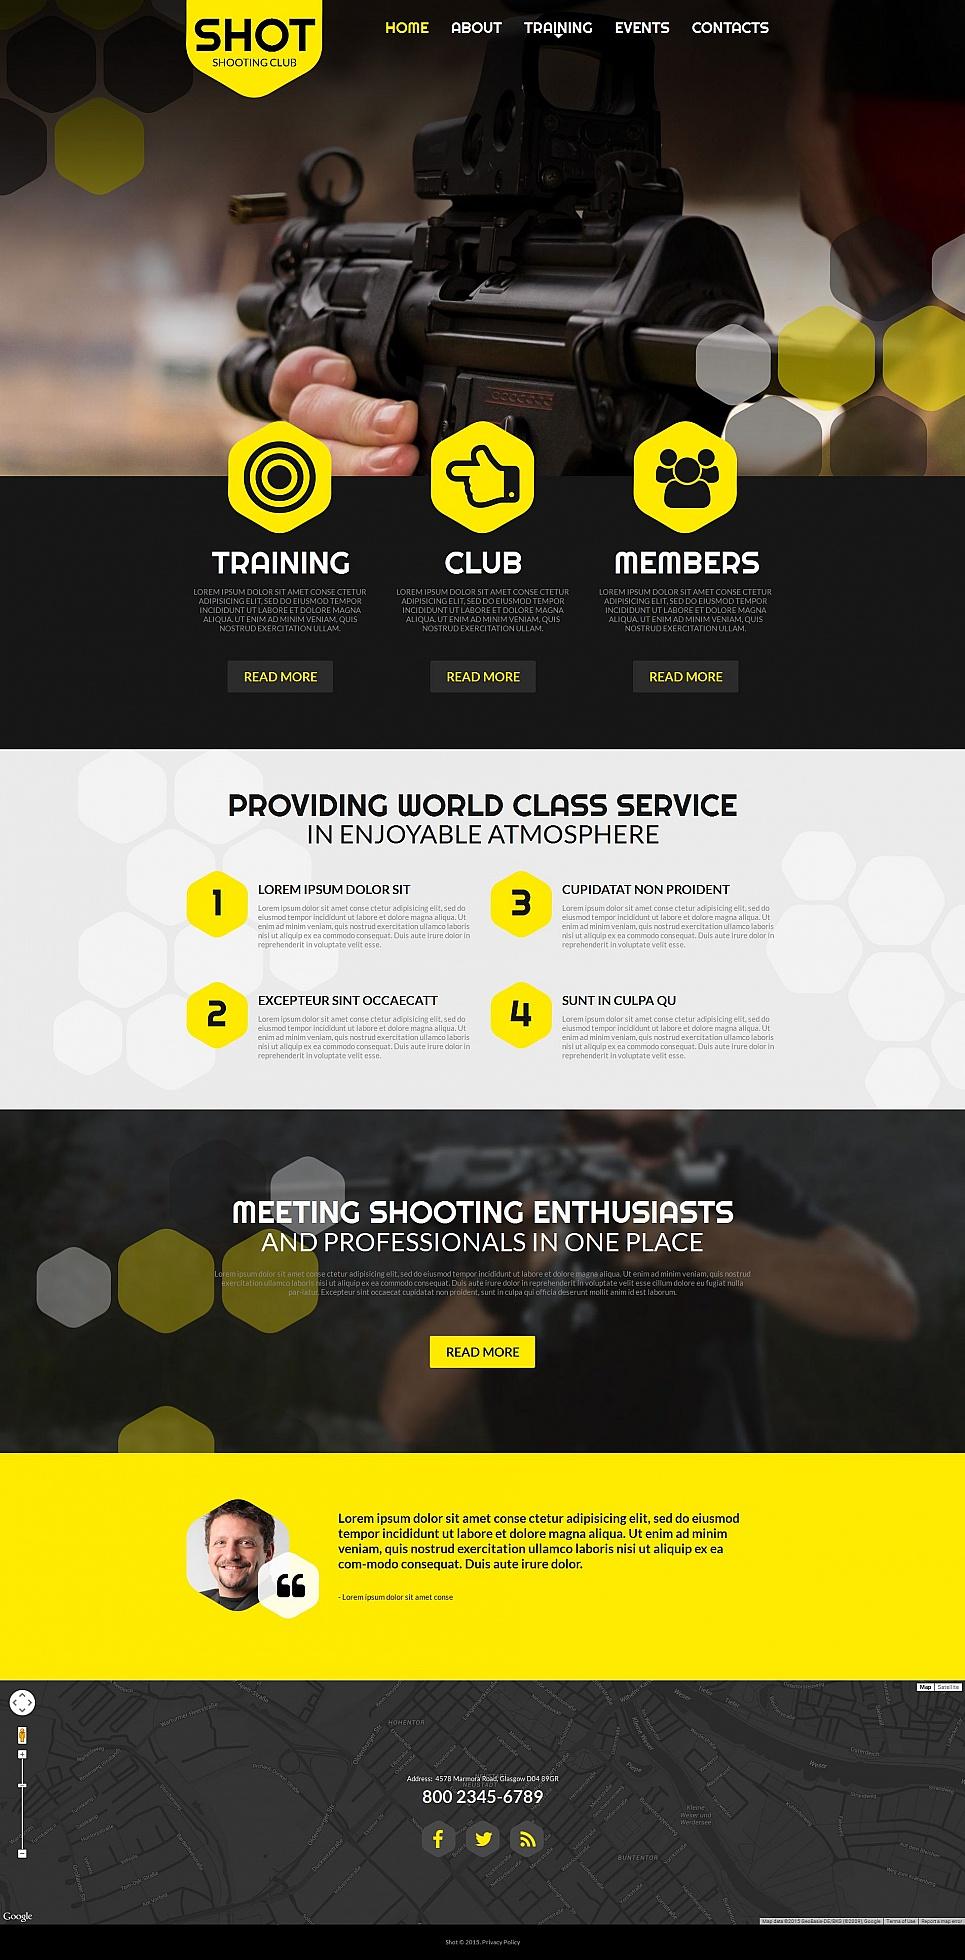 Sport MotoCMS HTML Template #55322 - image